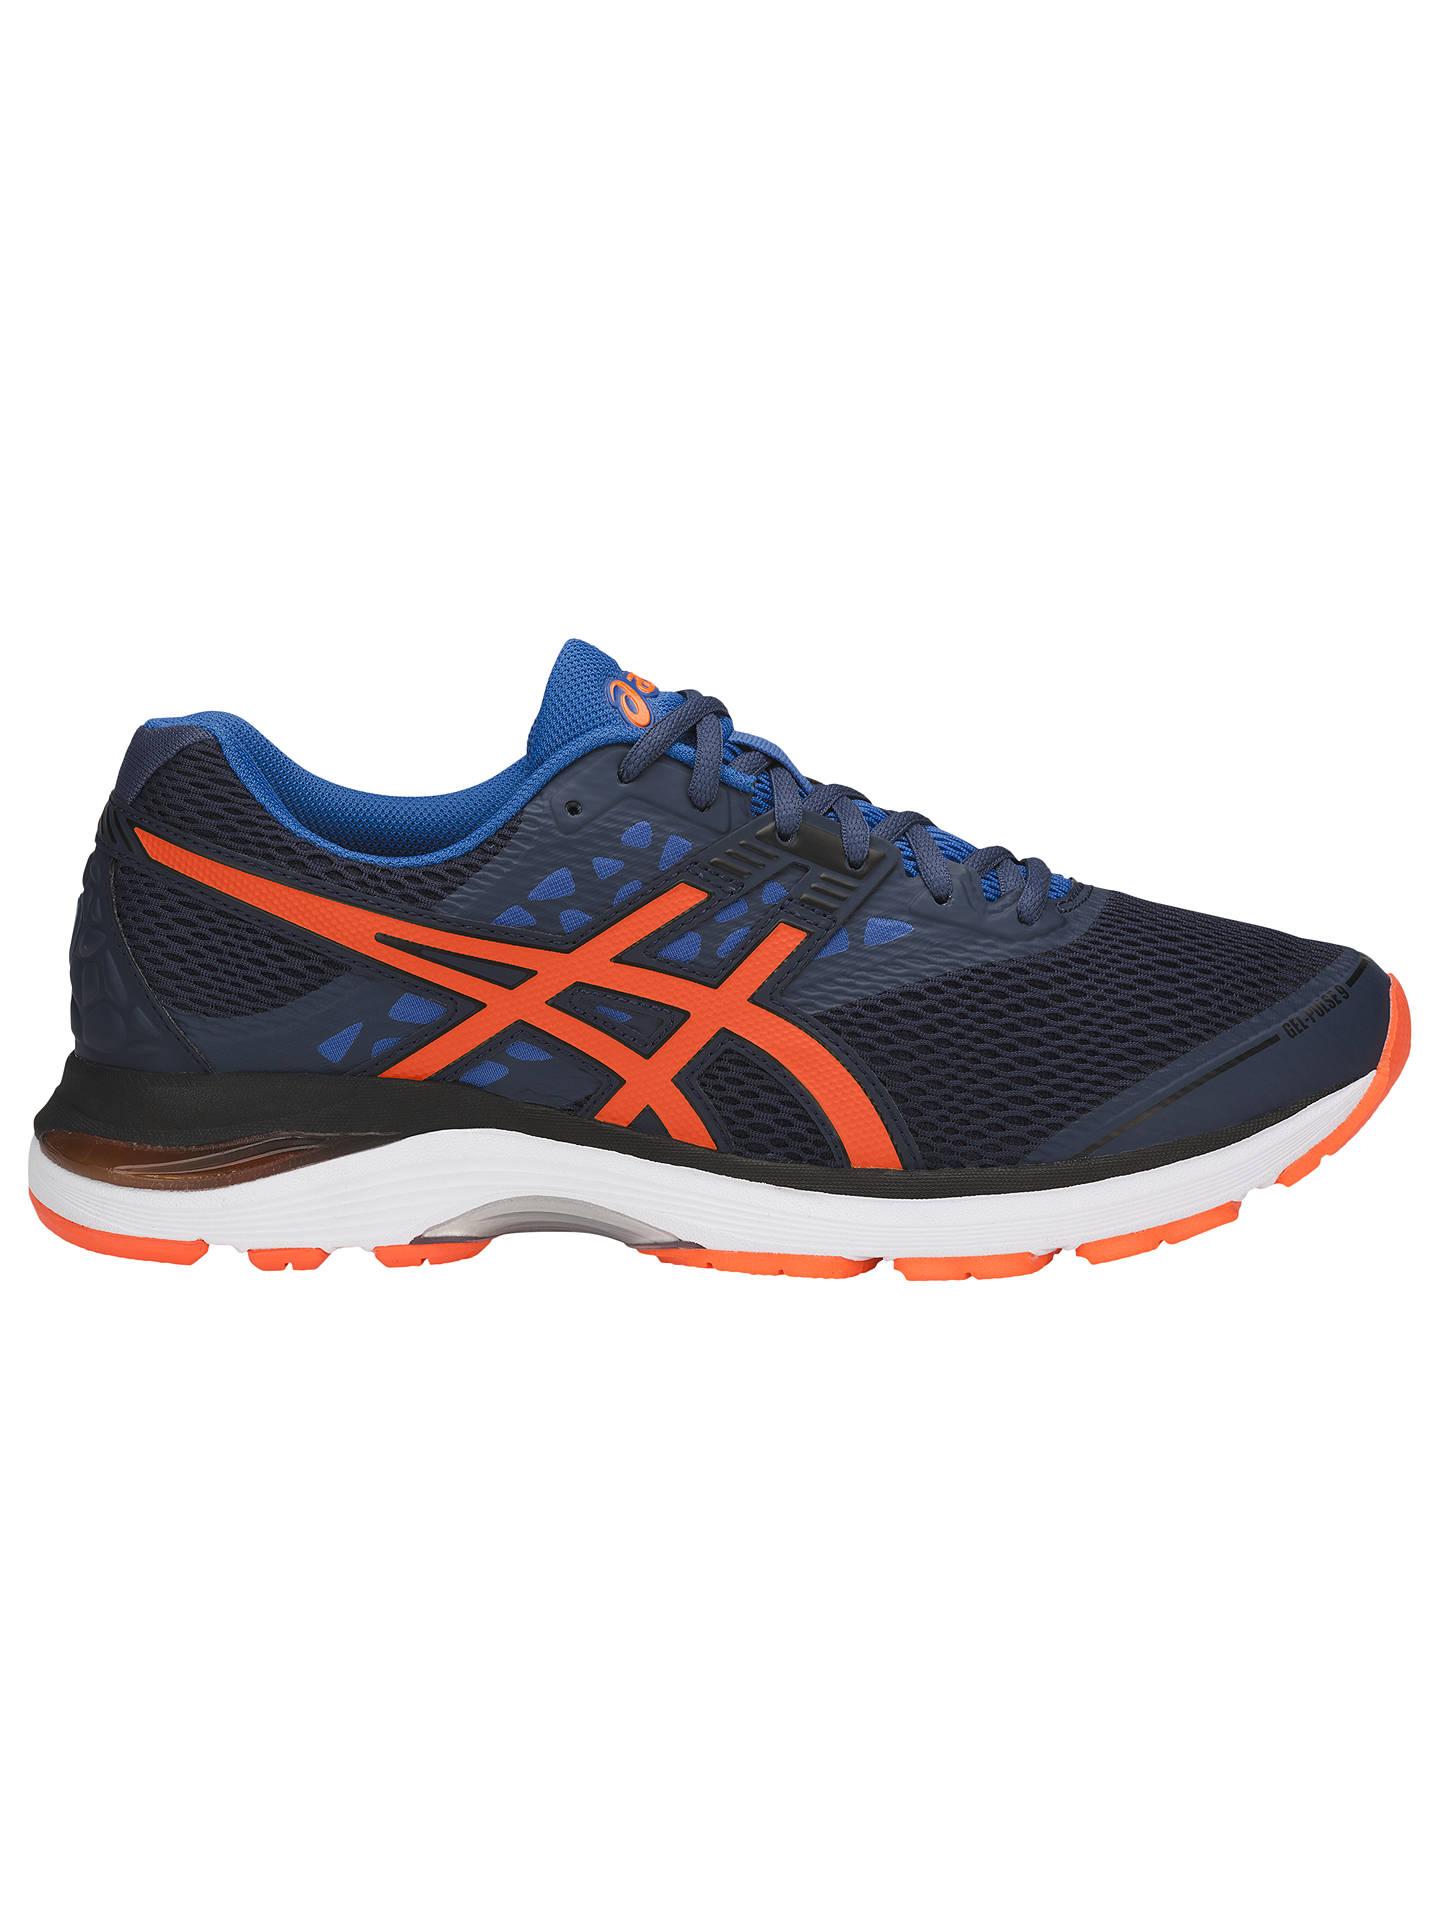 d9f7348eb88b Buy ASICS GEL-PULSE 9 Men s Running Shoes